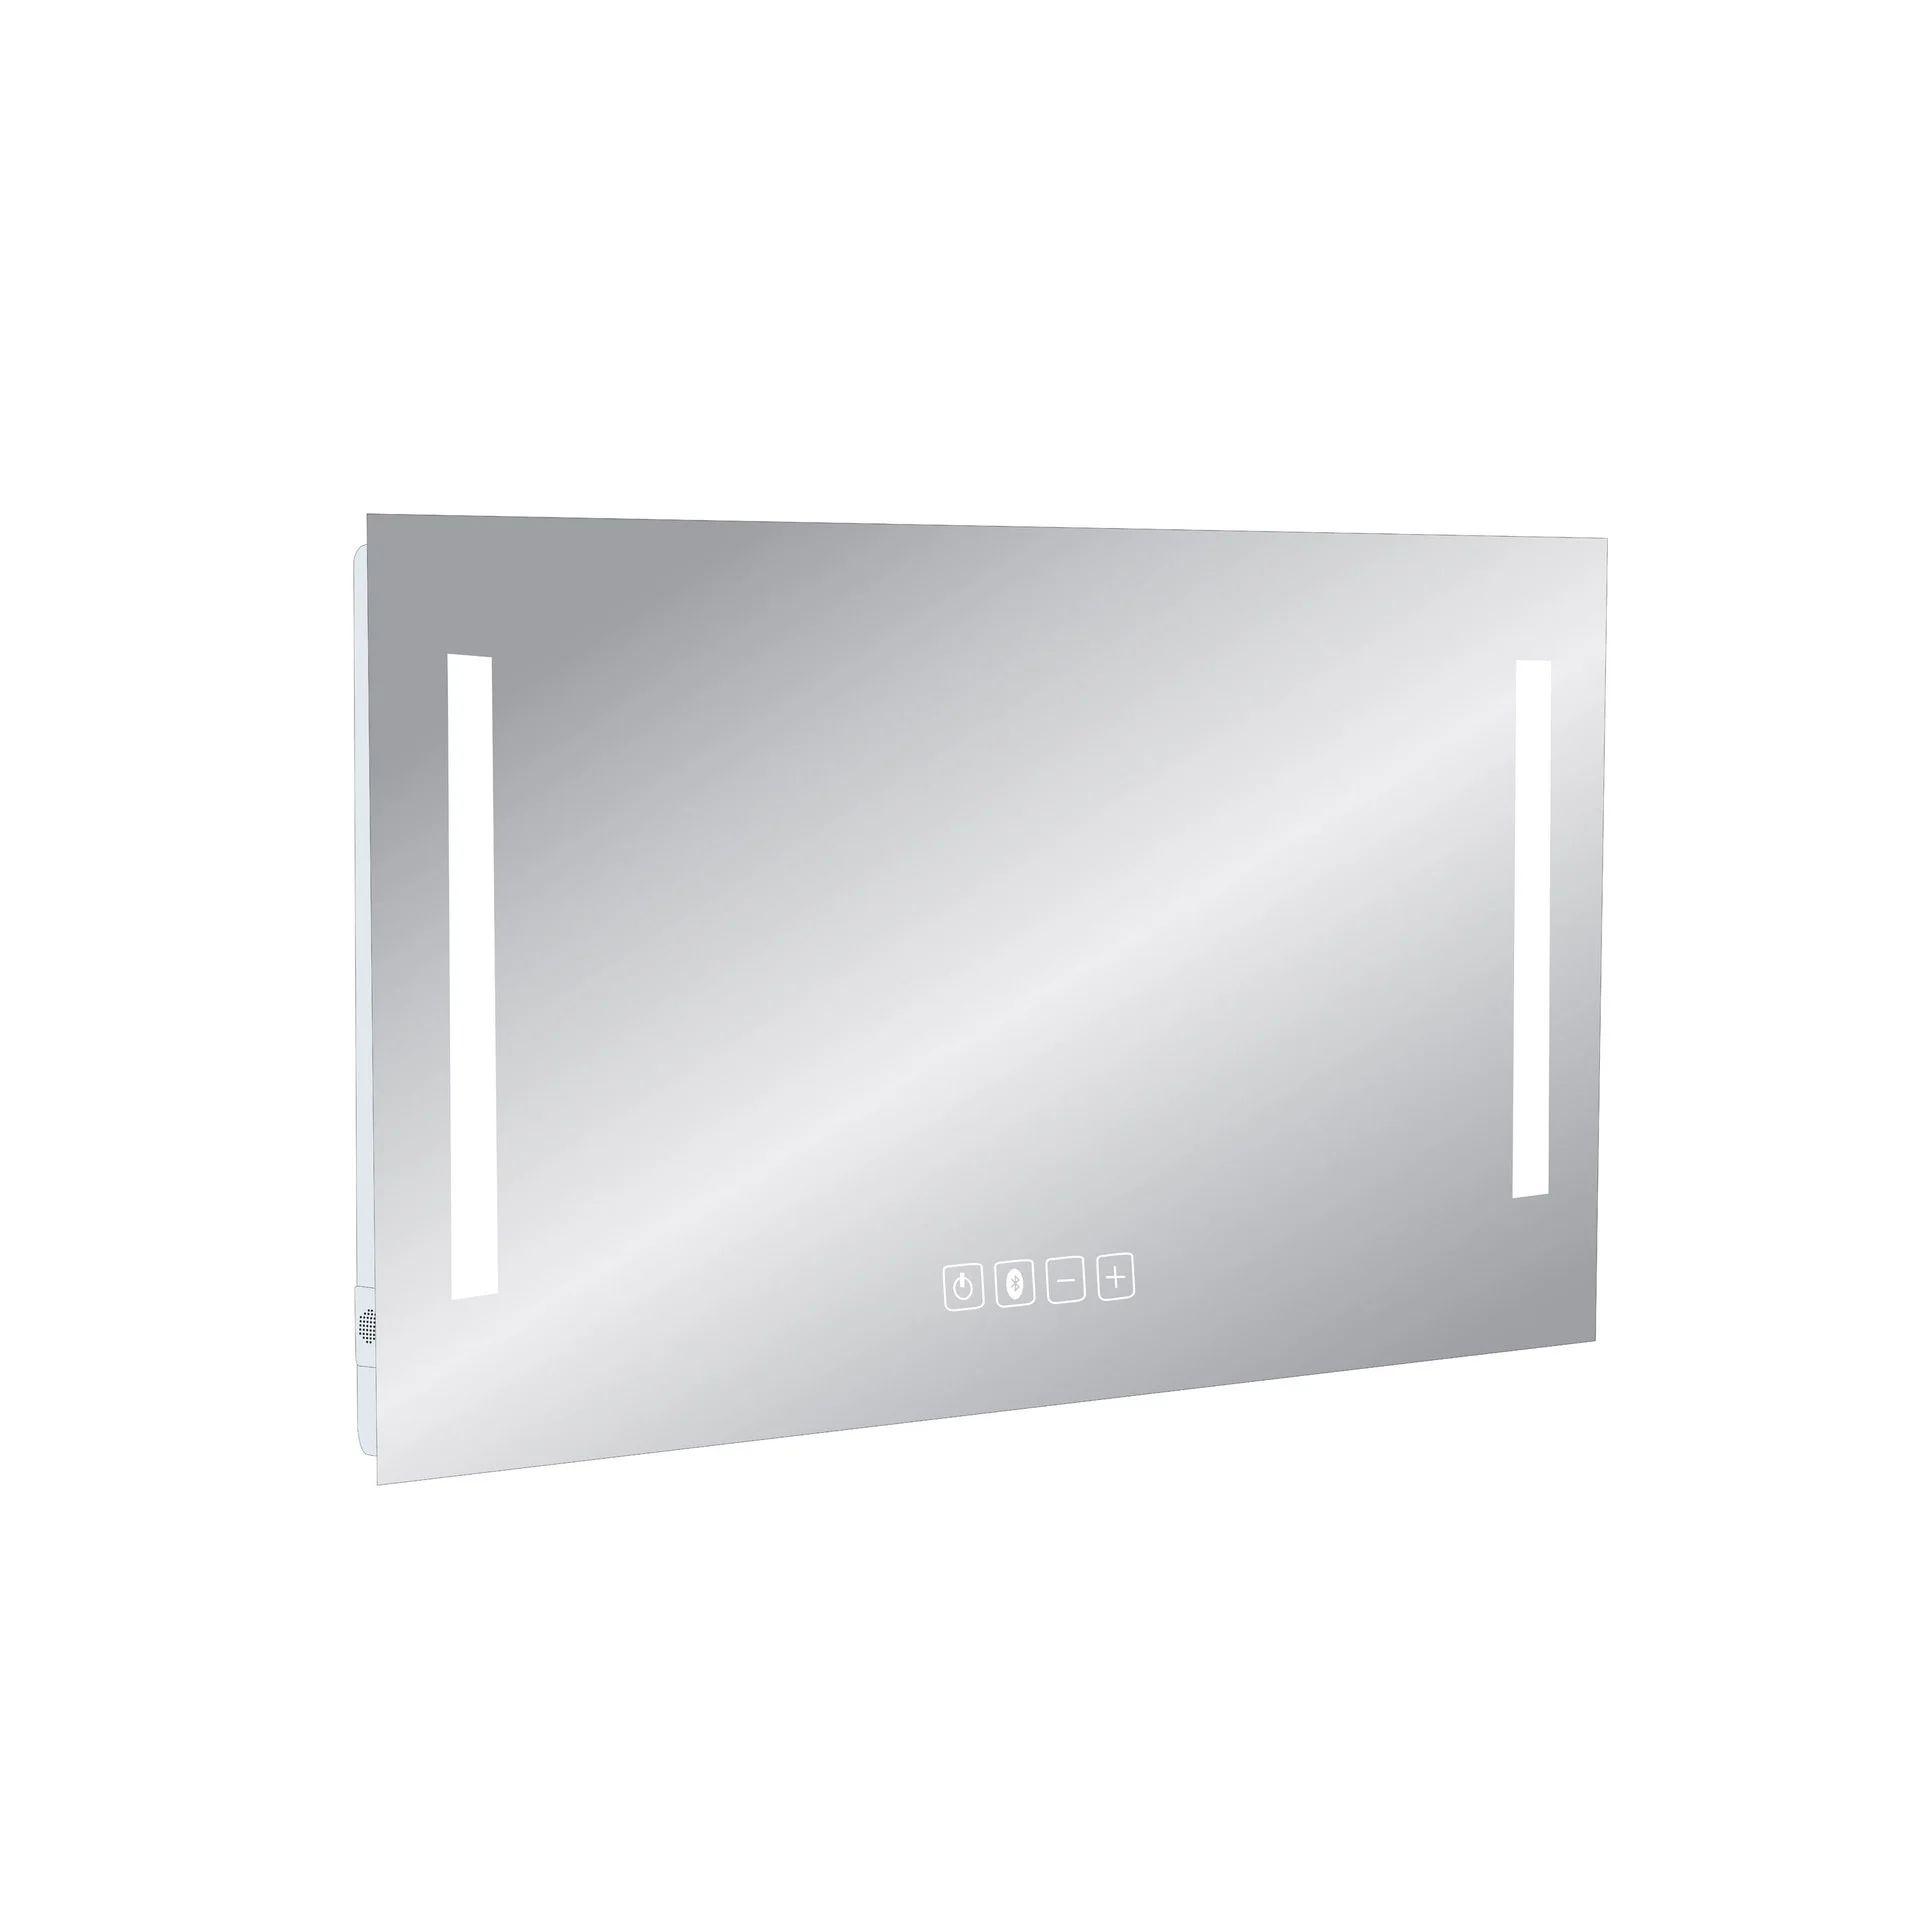 Miroir Lumineux Avec Eclairage Integre L 90 X H 70 Cm Suono2 Leroy Merlin